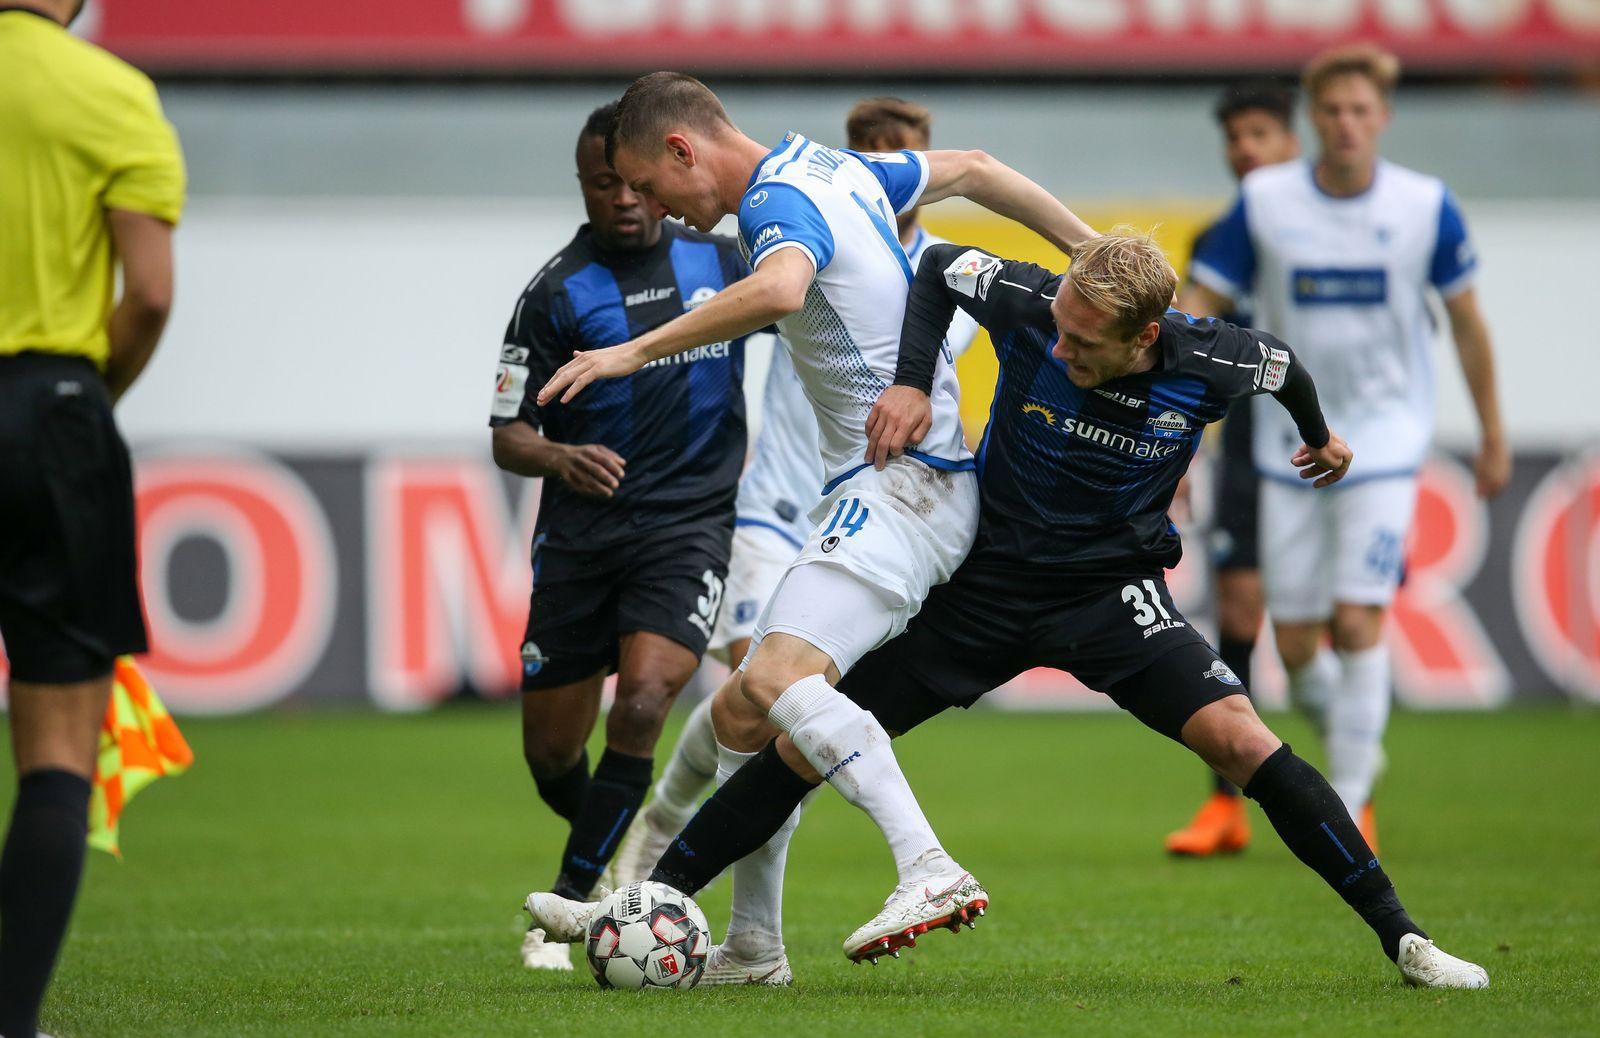 SC Paderborn 07 - 1. FC Magdeburg